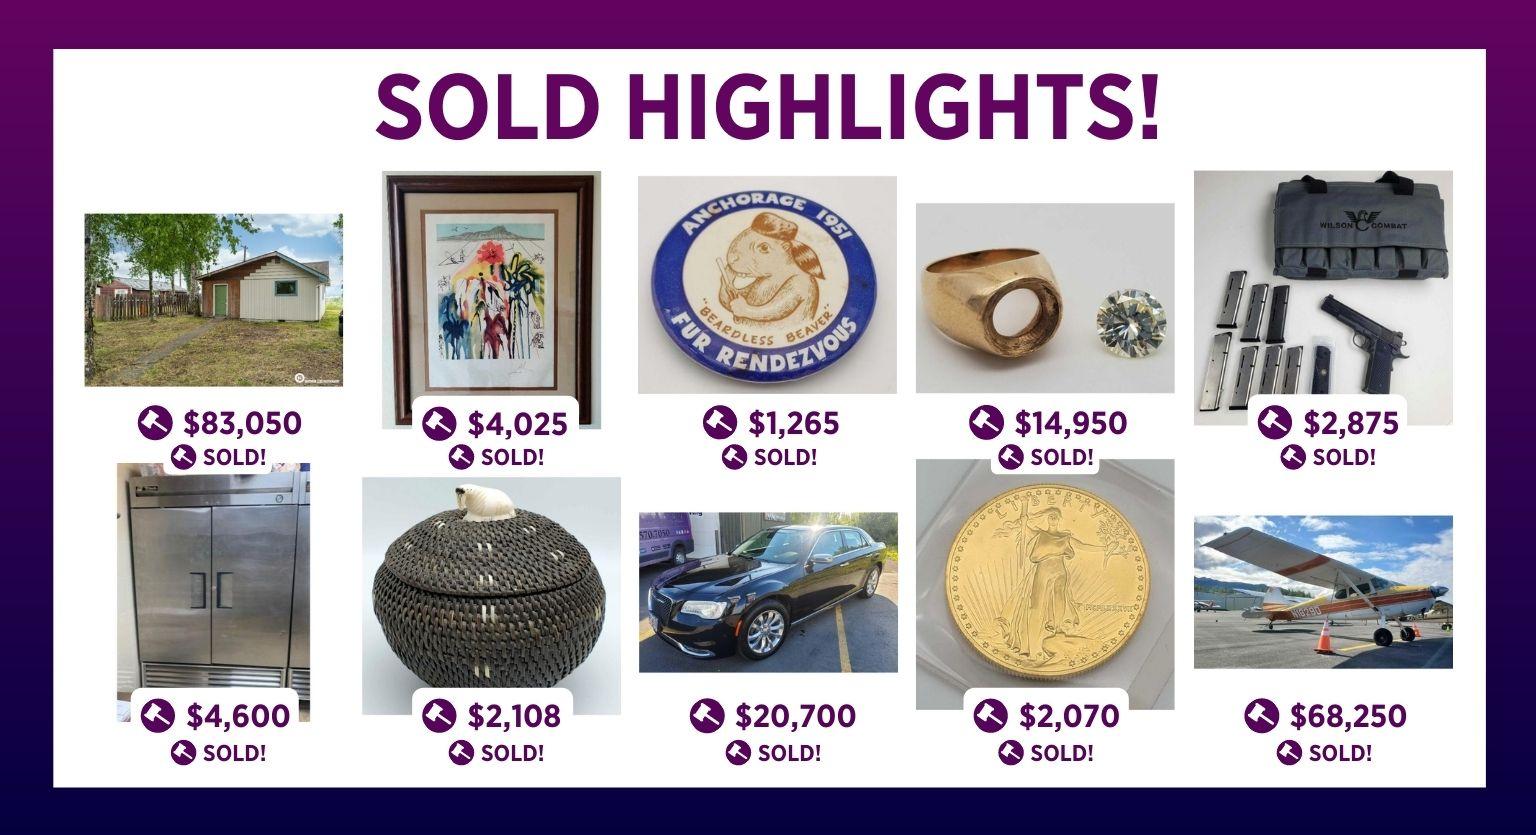 Alaska Premier Auctions & Appraisals Sold Highlights